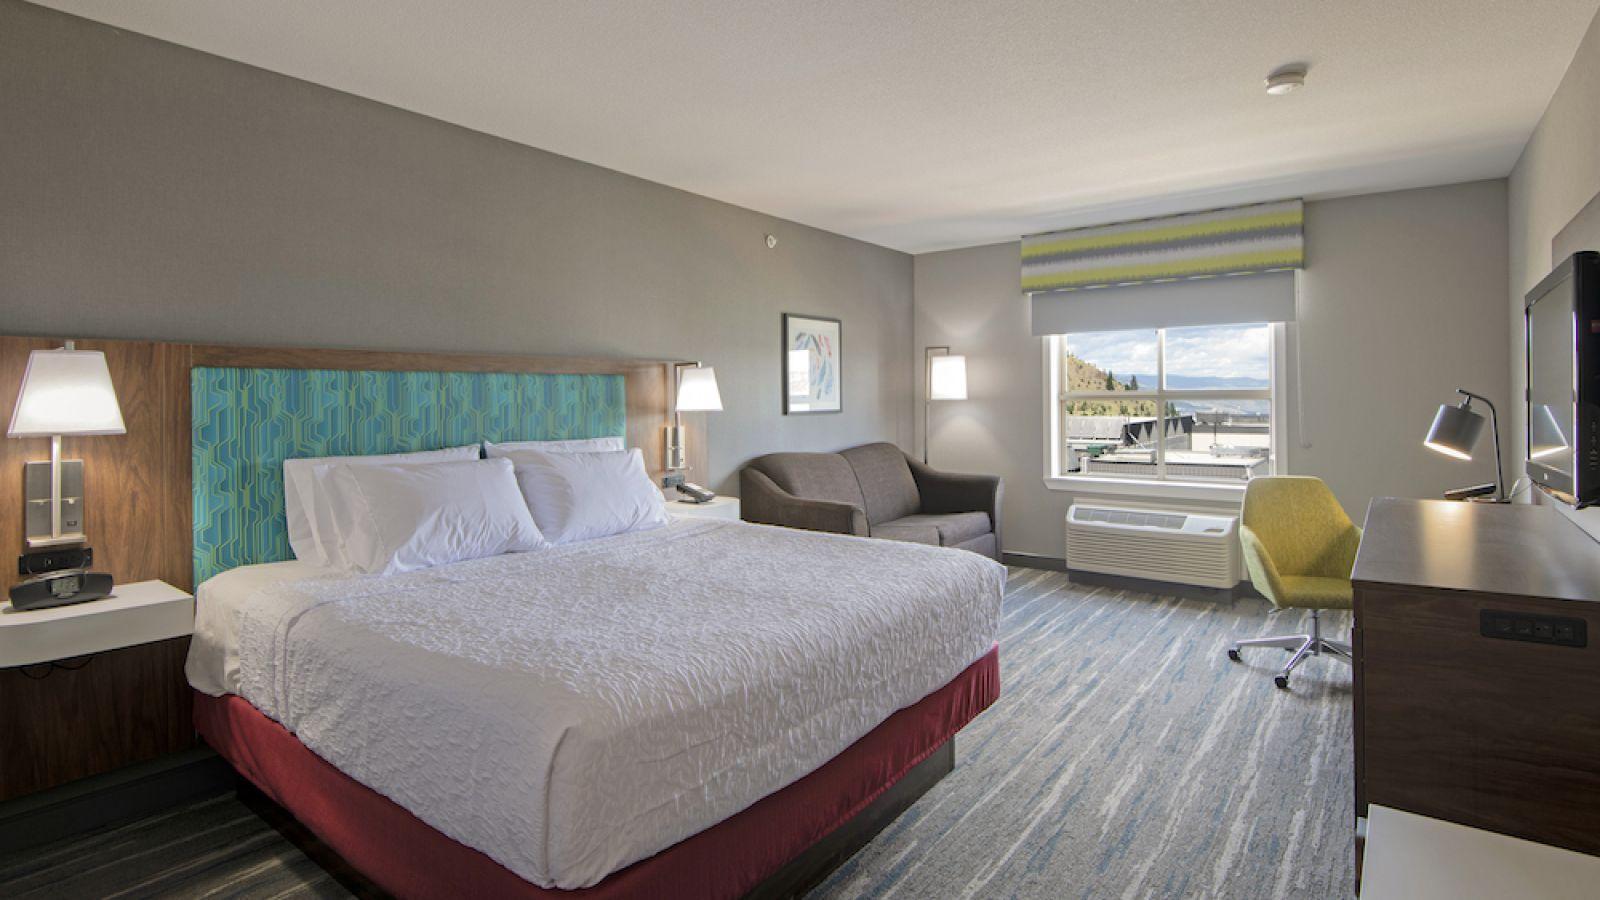 Hampton Inn Kamloops - King room - renovated